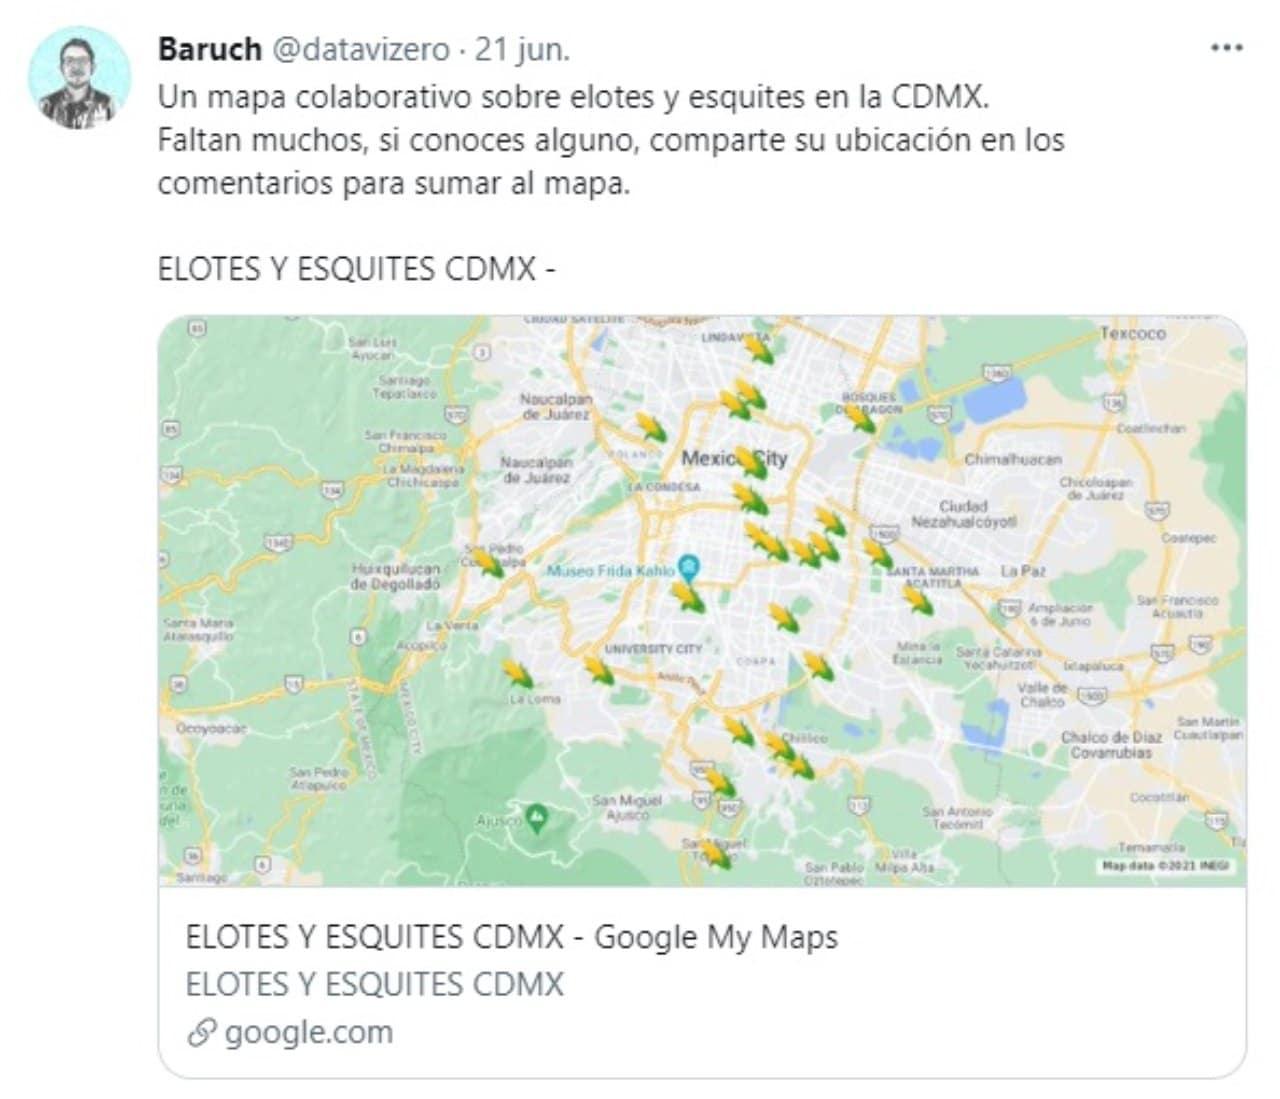 Baruch crea mapa elotes esquites CDMX